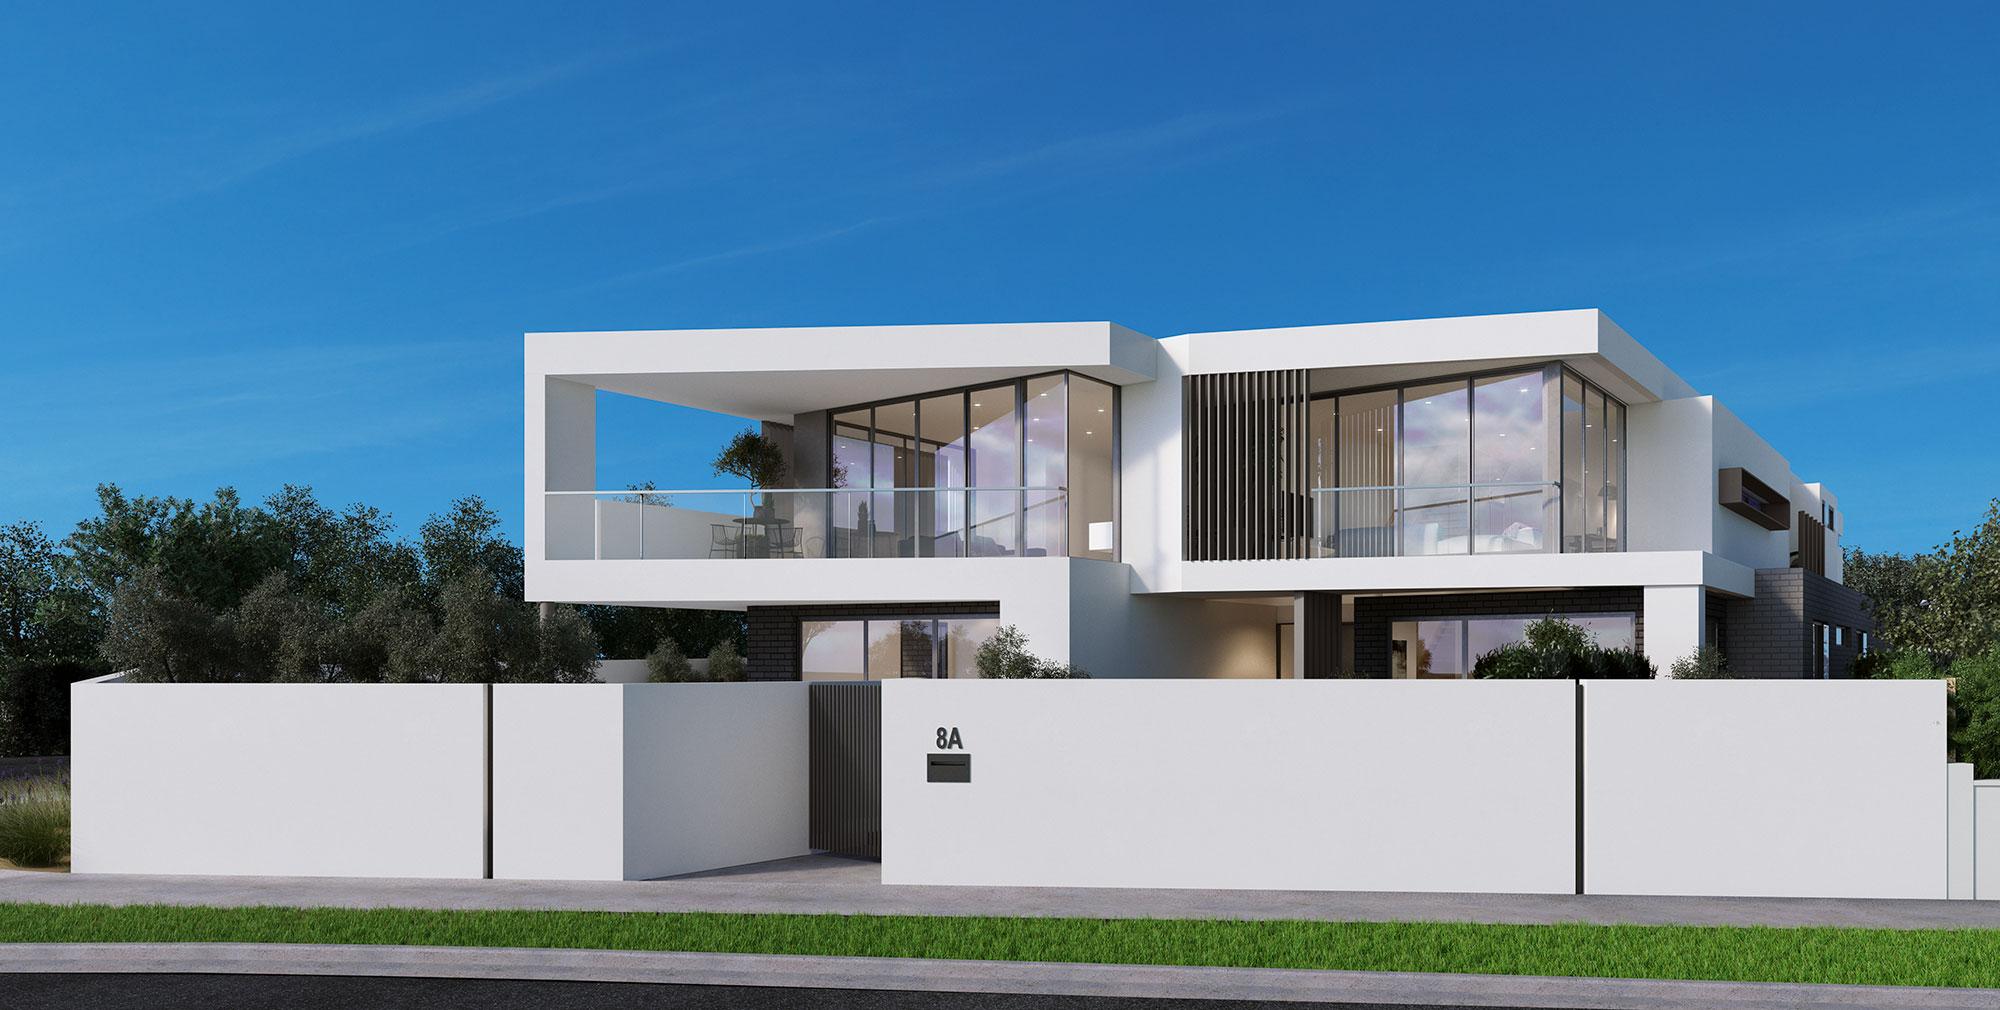 ArcViz-Studio-Alex-Lowe-Design-Exterior-render-visualsation-Beach-st-01.jpg